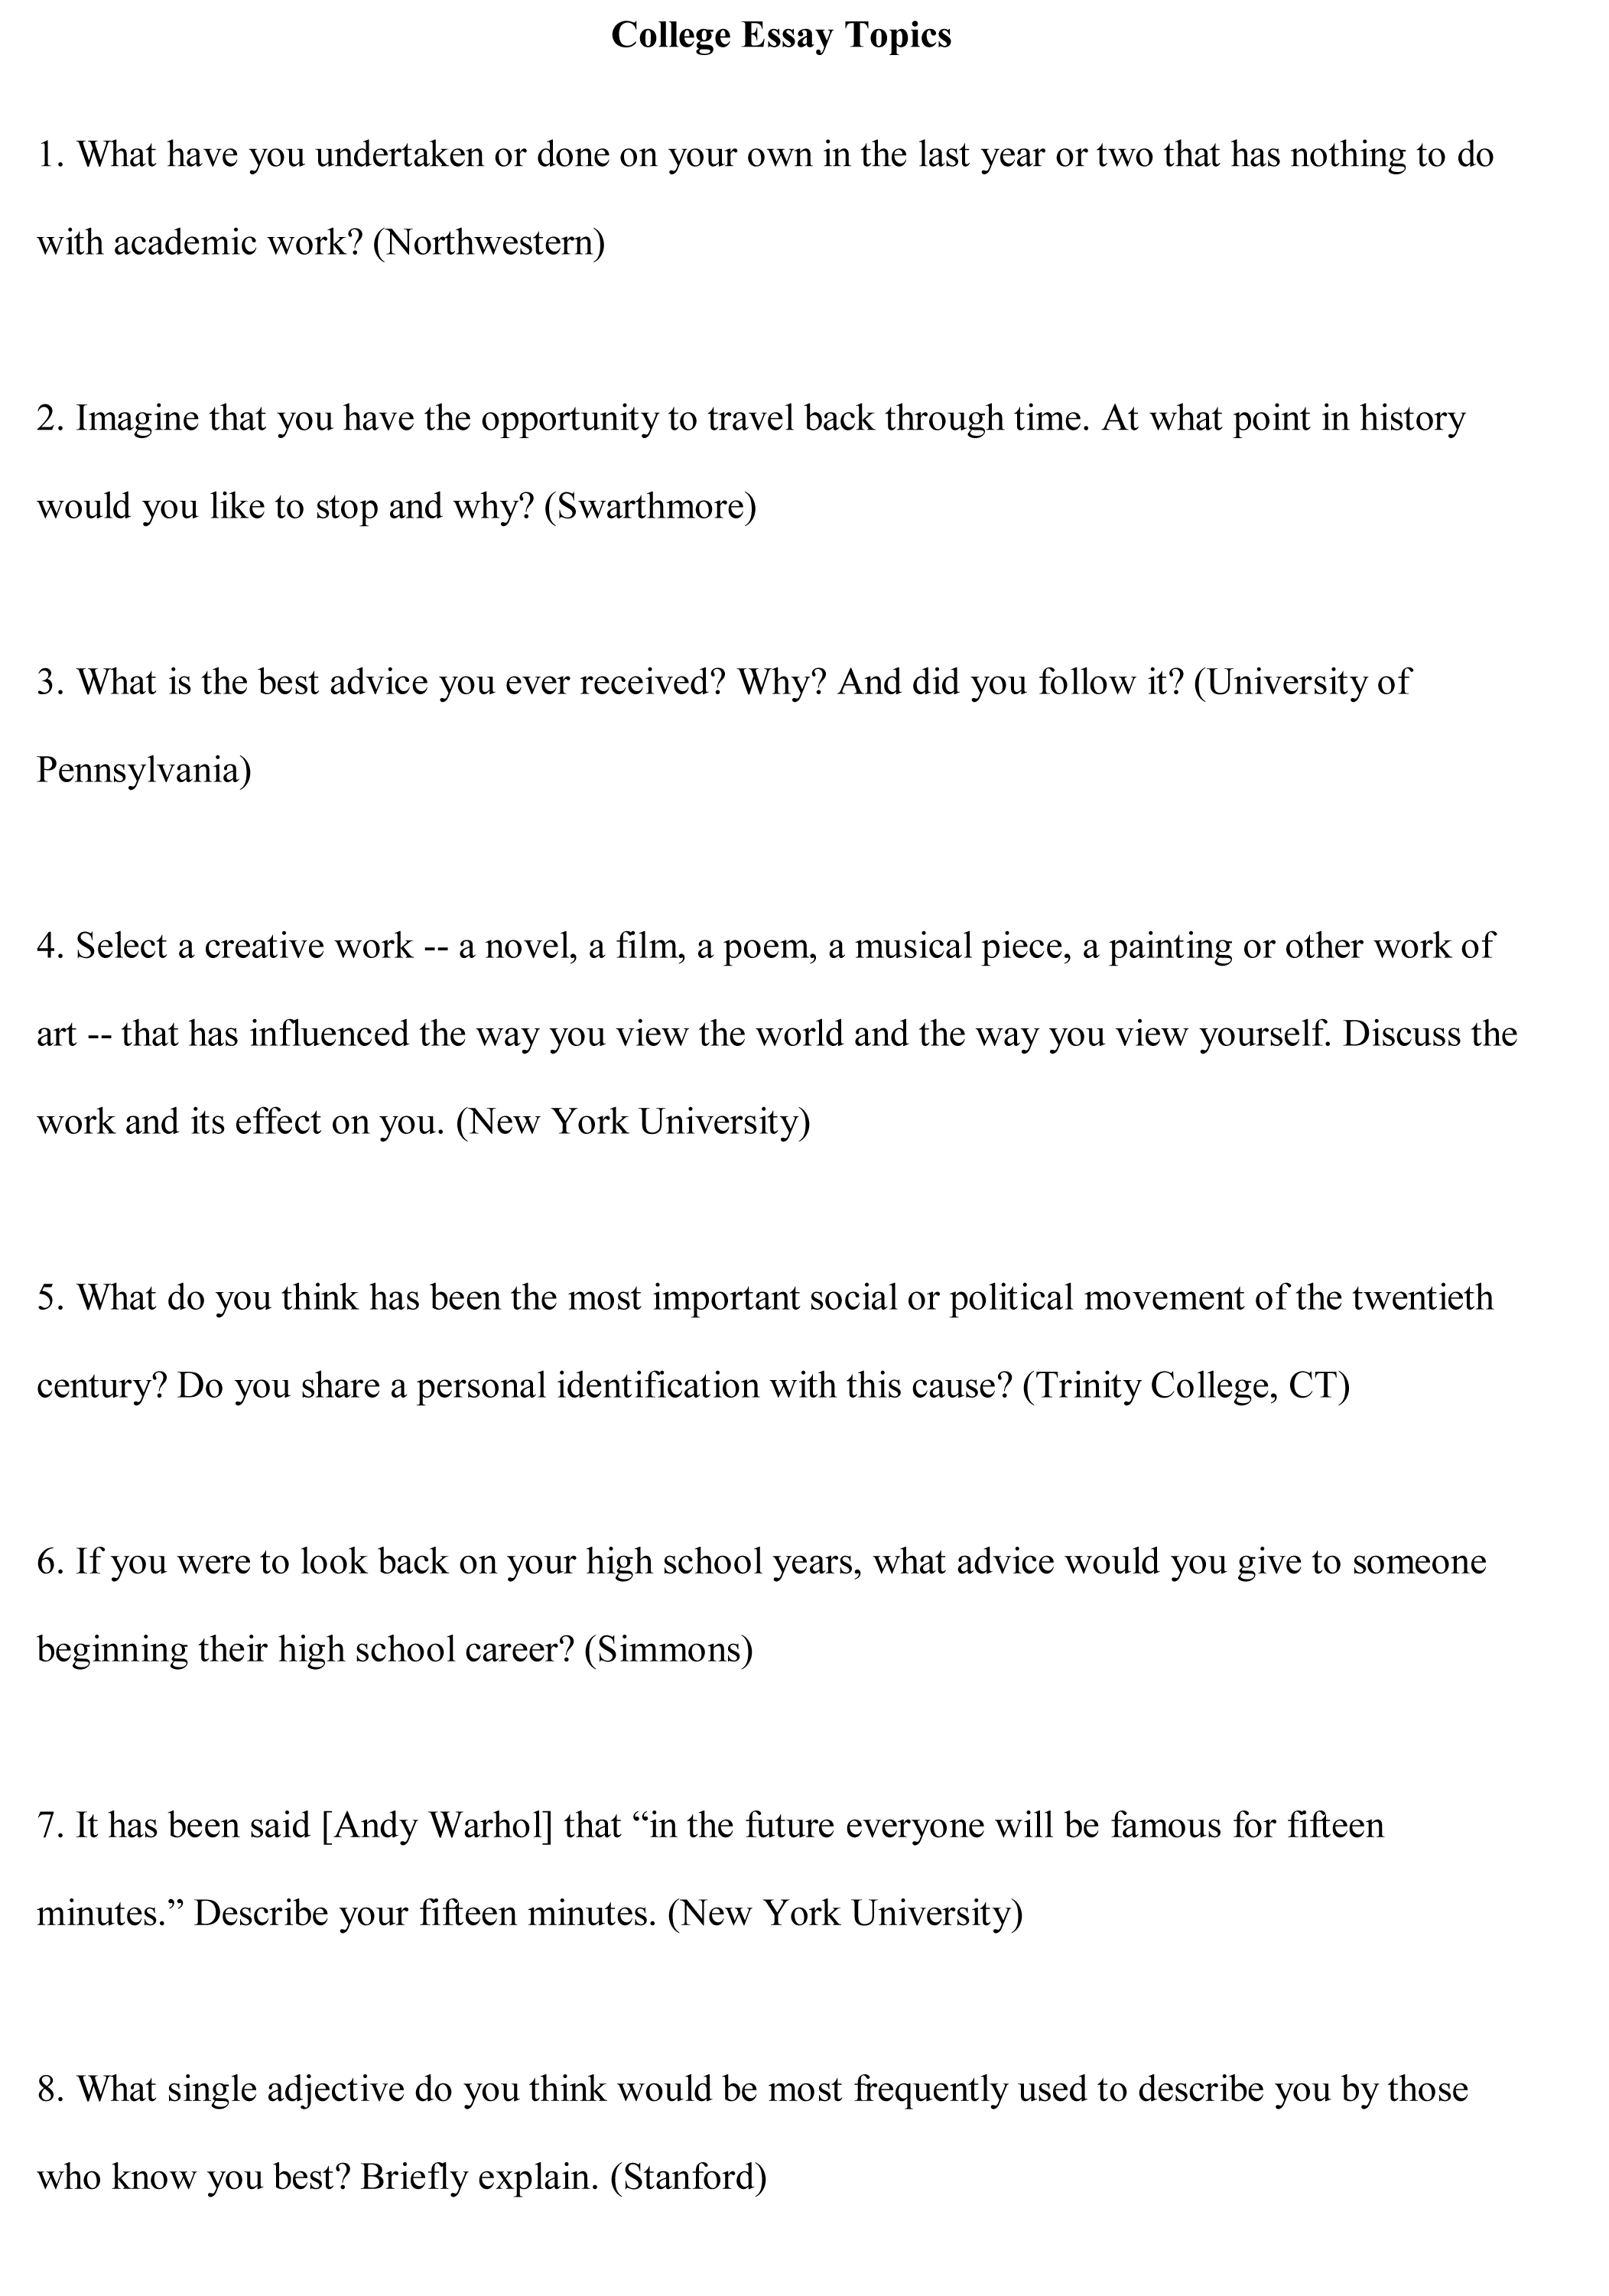 012 Essay Example College Topics Free Sample1 Magnificent Reworder Best Rewriter Software Download App Full